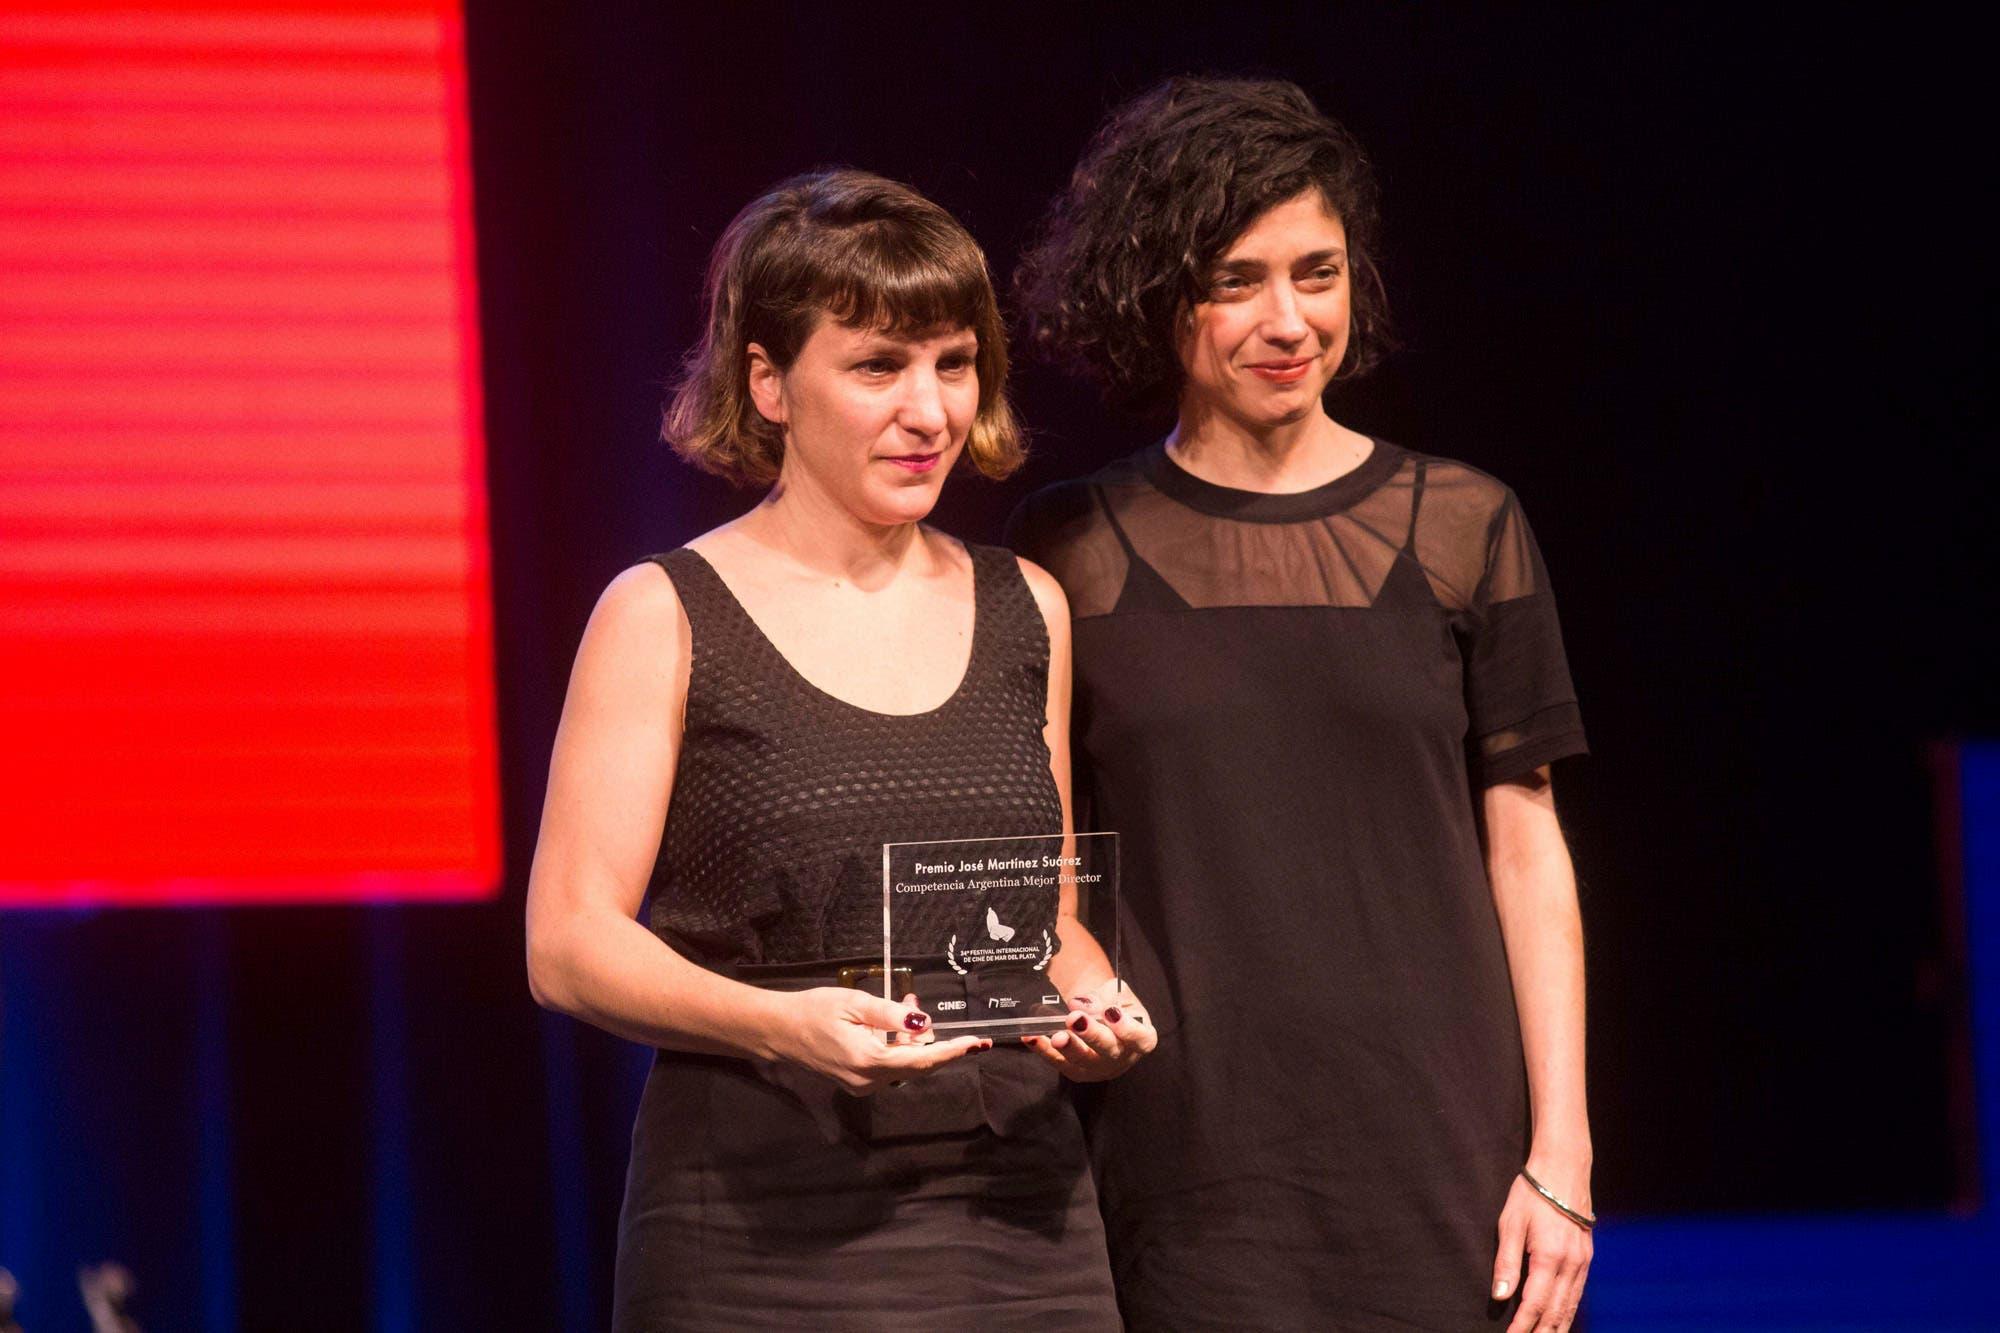 Festival de cine de Mar del Plata: ganó la española O que arde, de Oliver Laxe